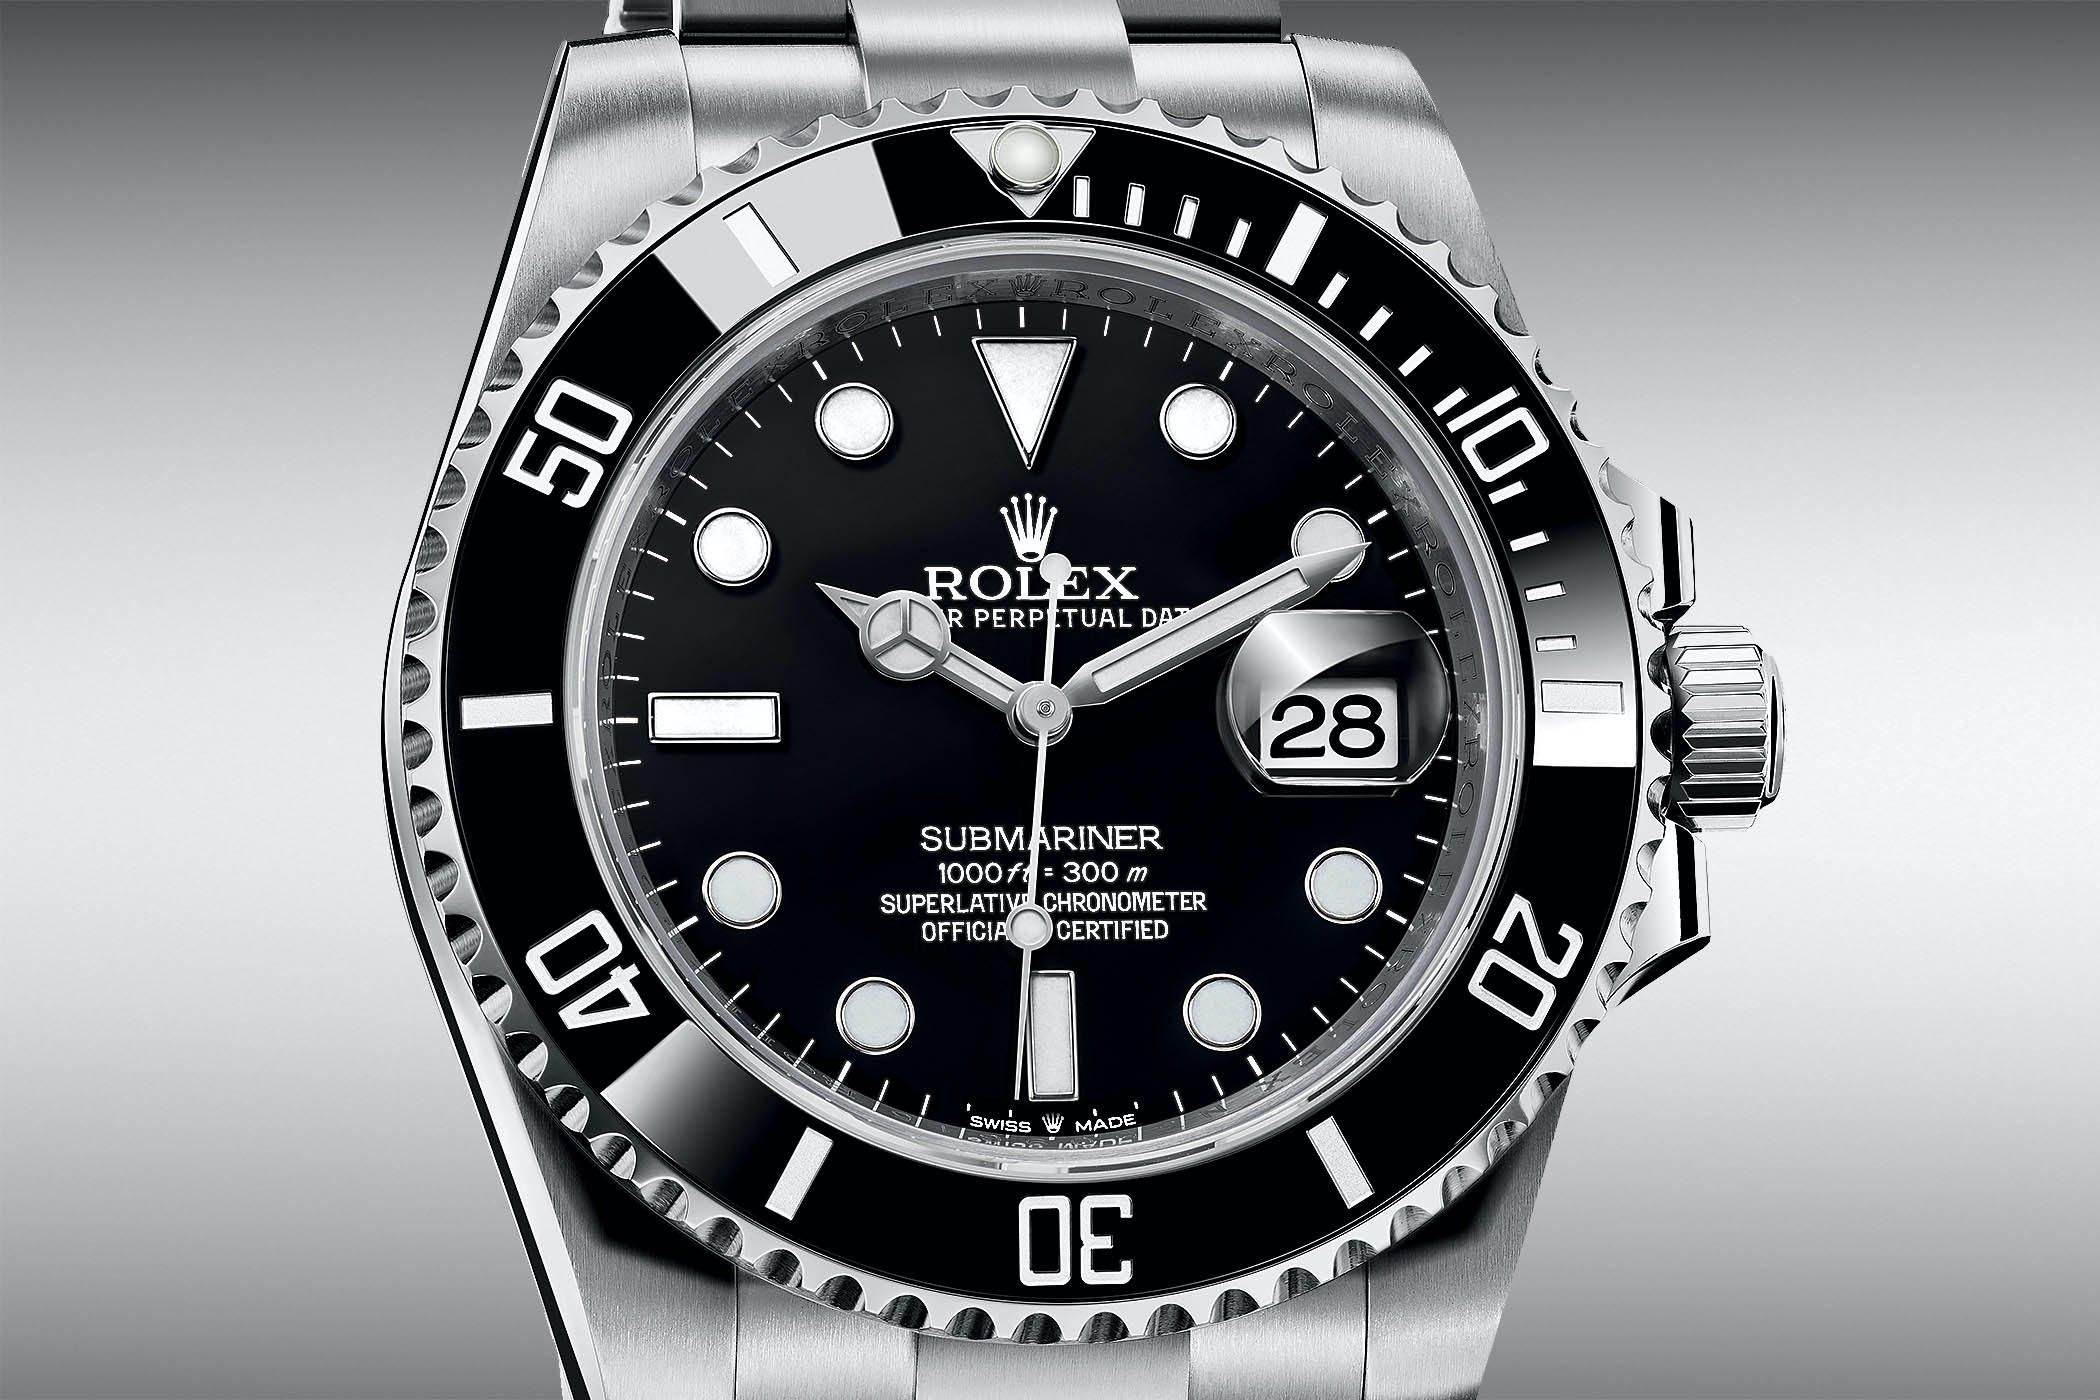 Rolex Submariner Date Calibre 3235 - 126610LN - Rolex Baselworld 2020 - Rolex 2020 Predictions